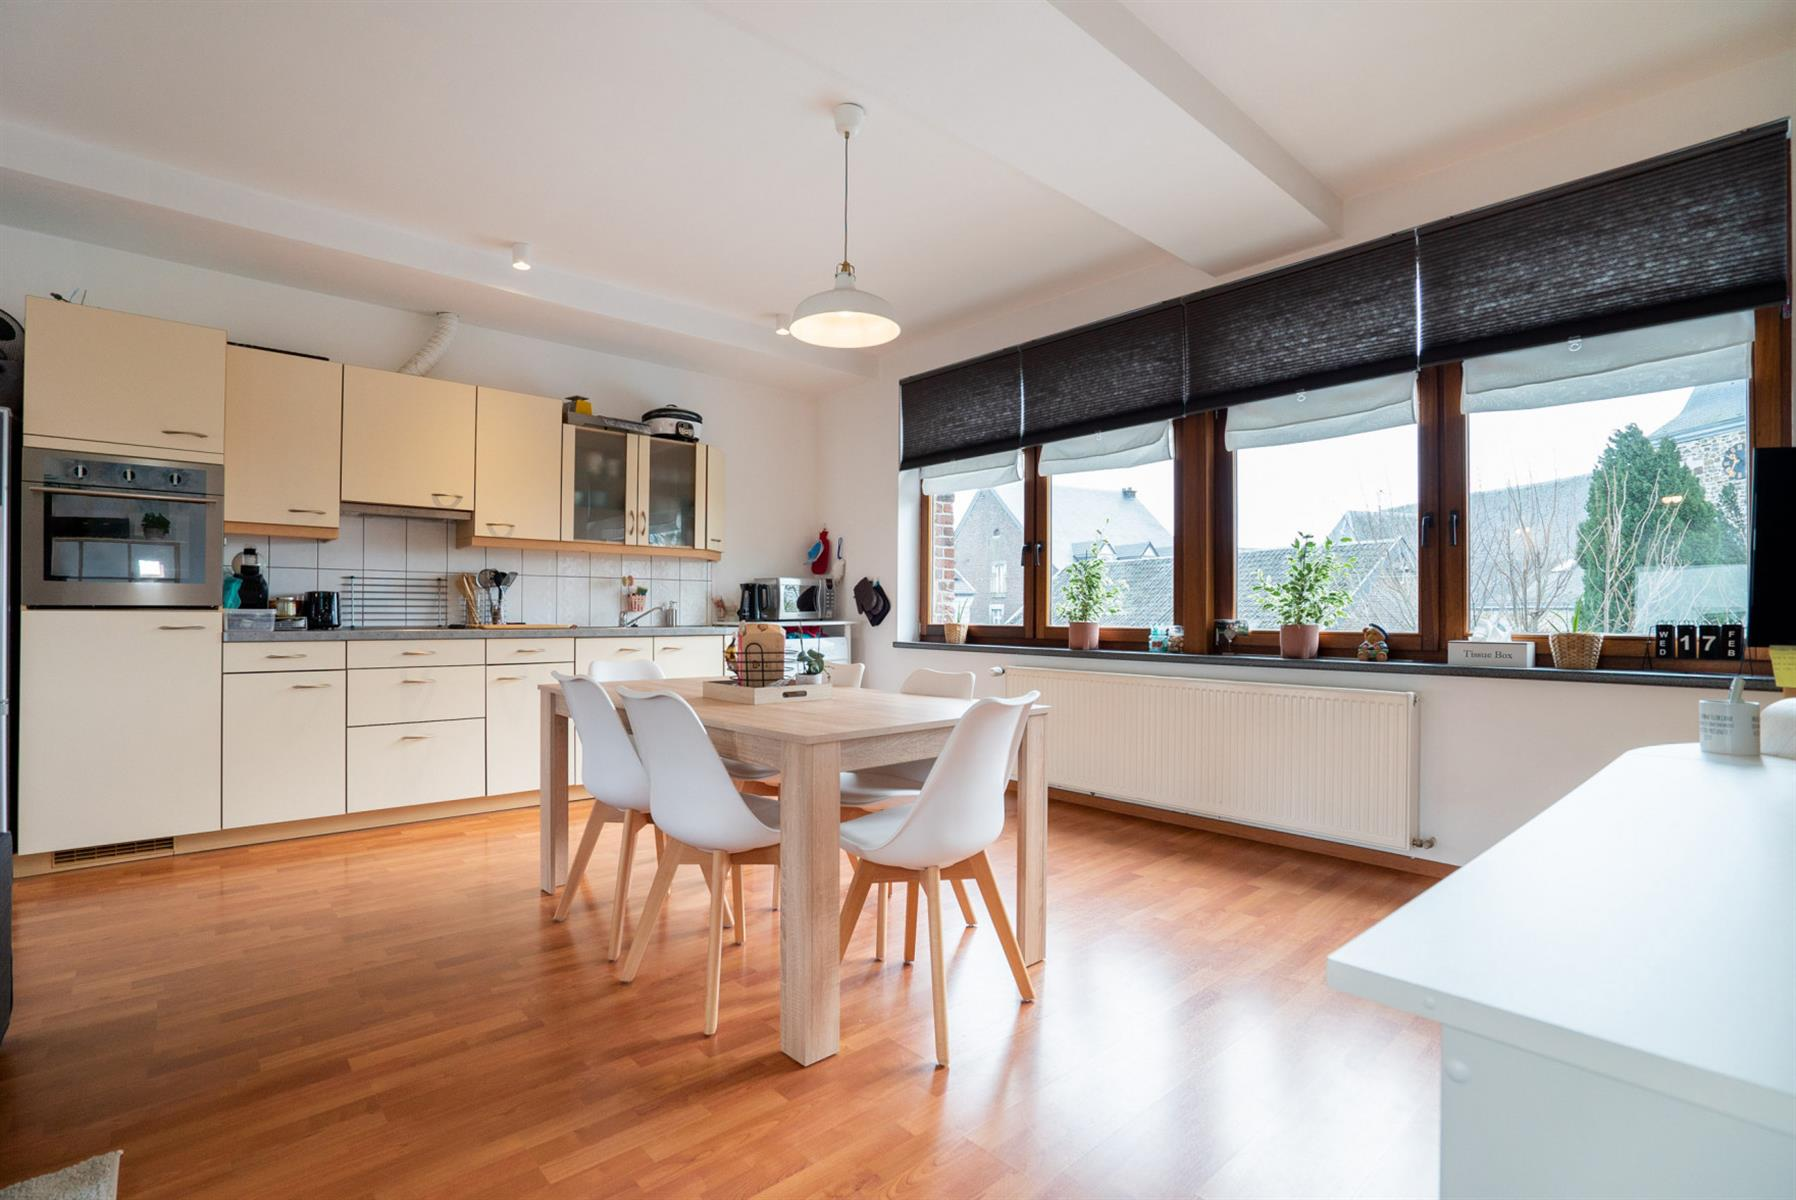 Appartement - Welkenraedt Henri-Chapelle - #4270870-2